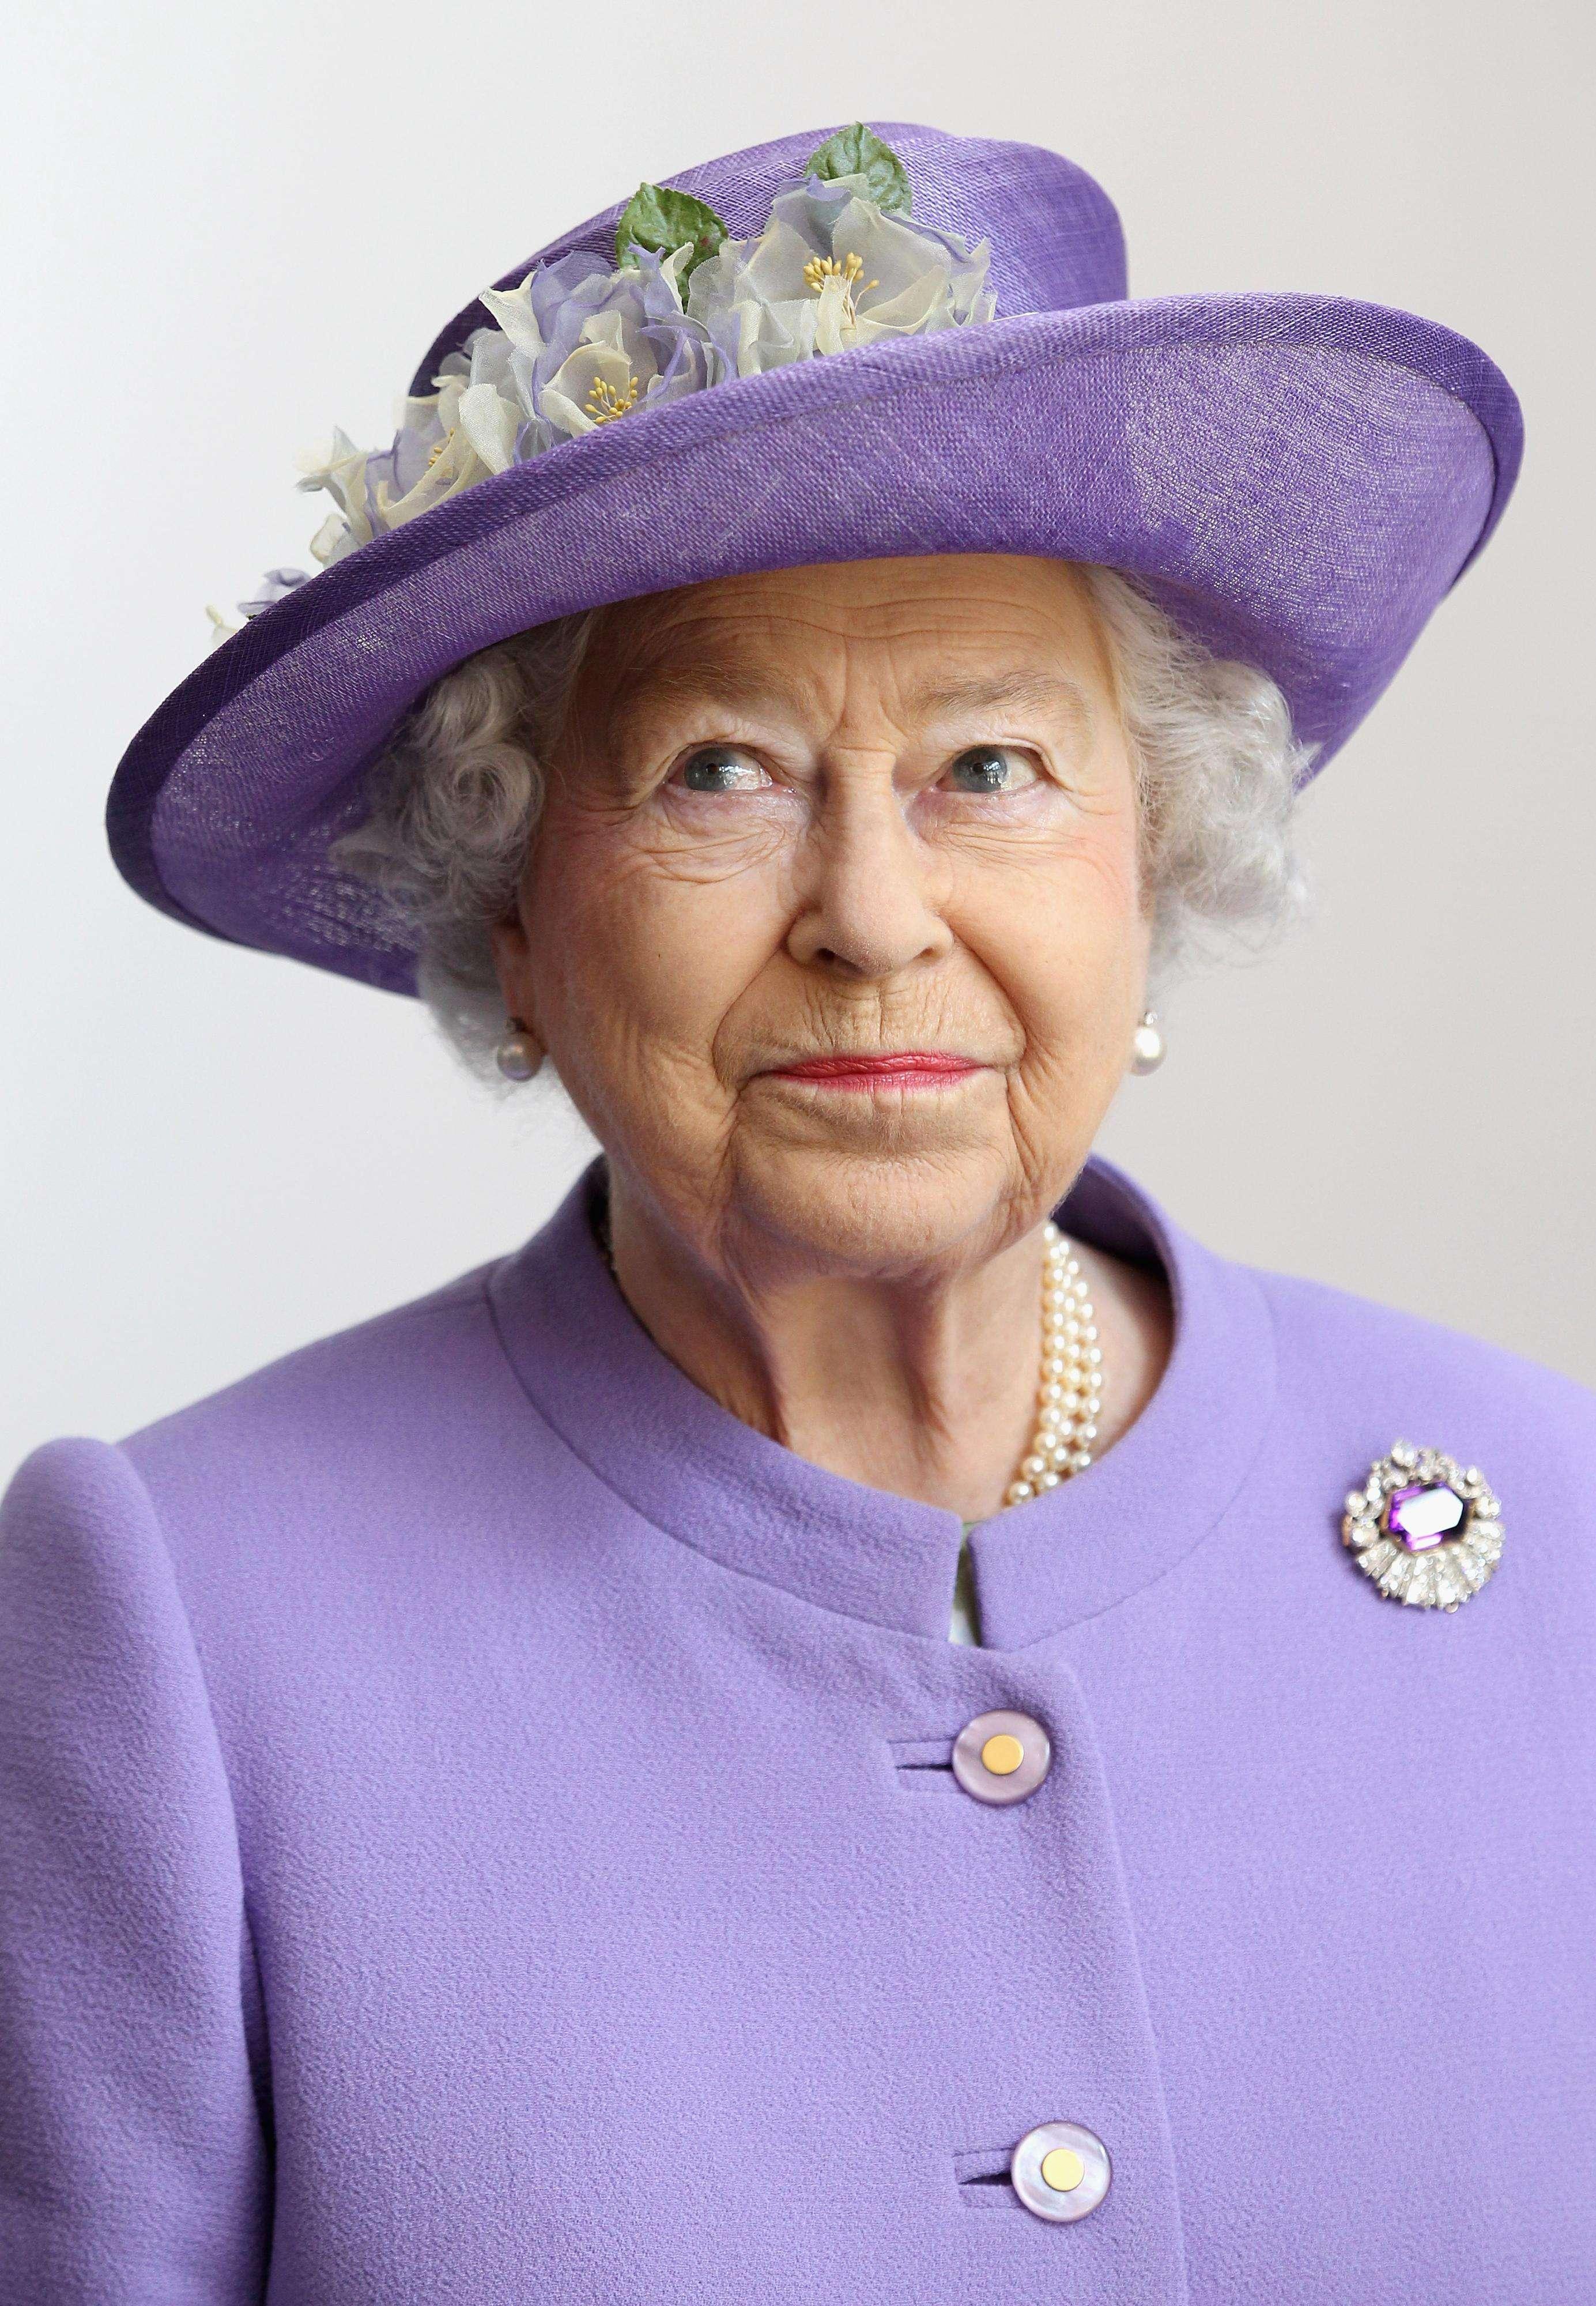 Rainha disse que britânicos devem se unir Foto:  Chris Jackson/Getty Images